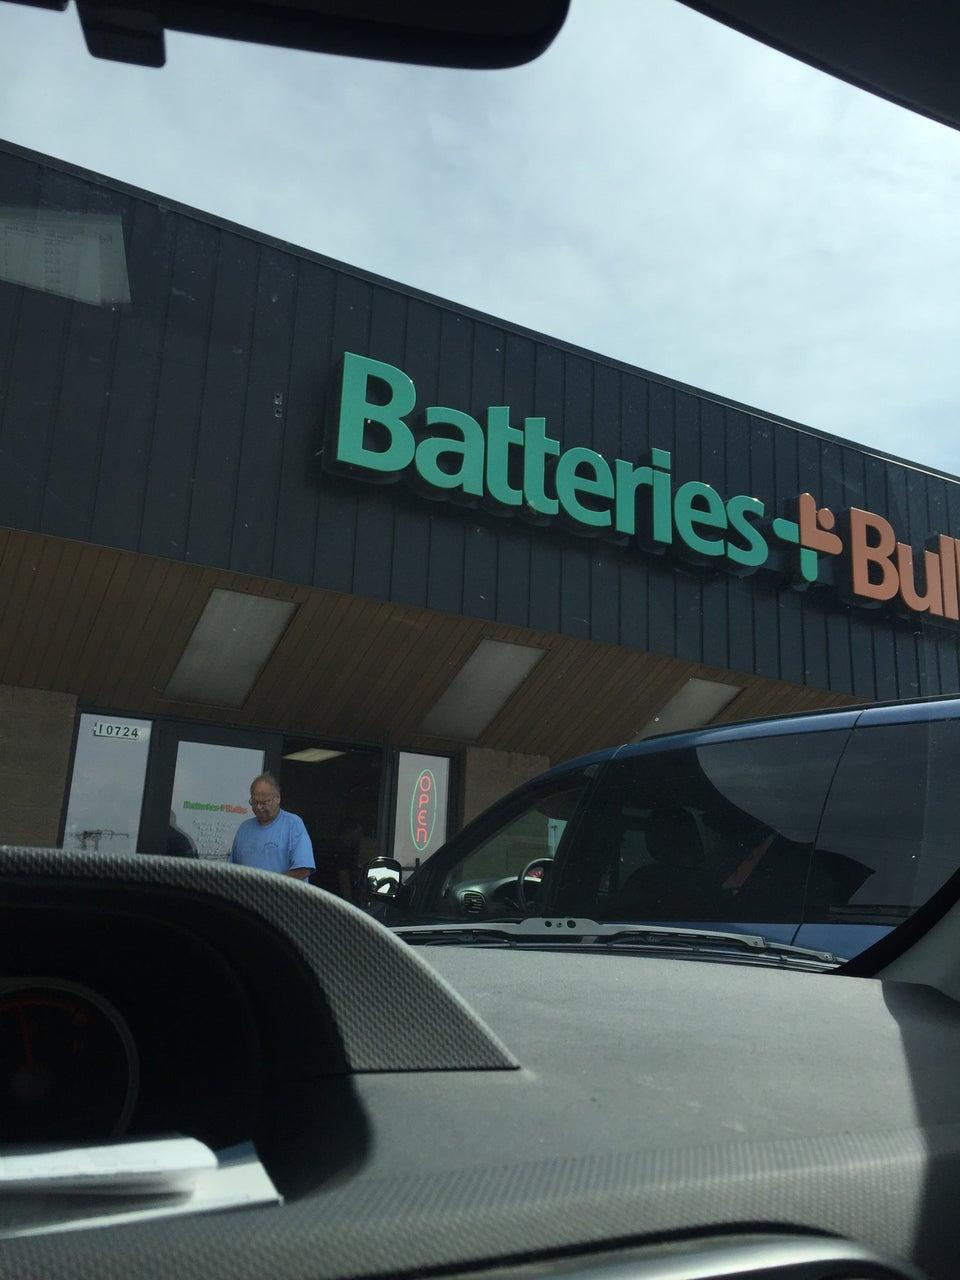 Batteries Plus Bulbs 10724 W Greenfield Ave, West Allis